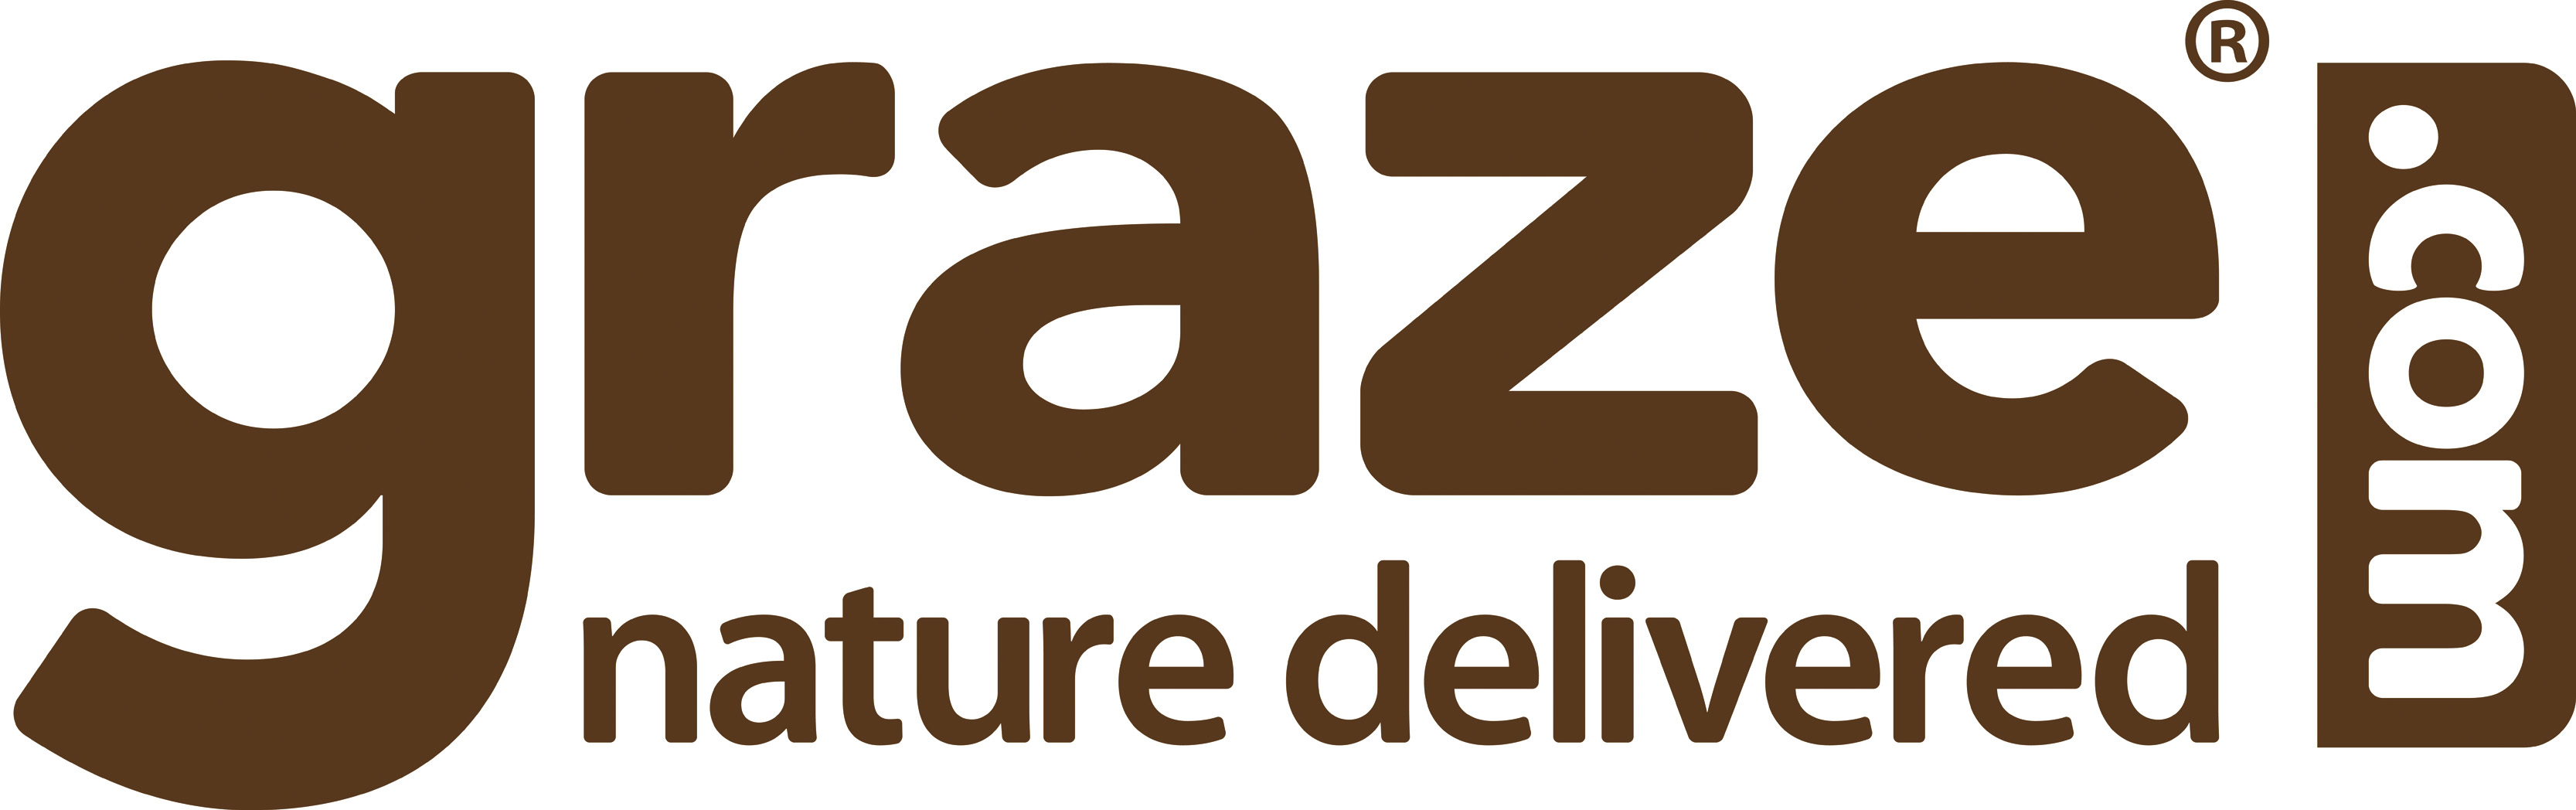 http://graze.presspack.s3.amazonaws.com/Logo-BrownOnWhite-DotCom.jpg